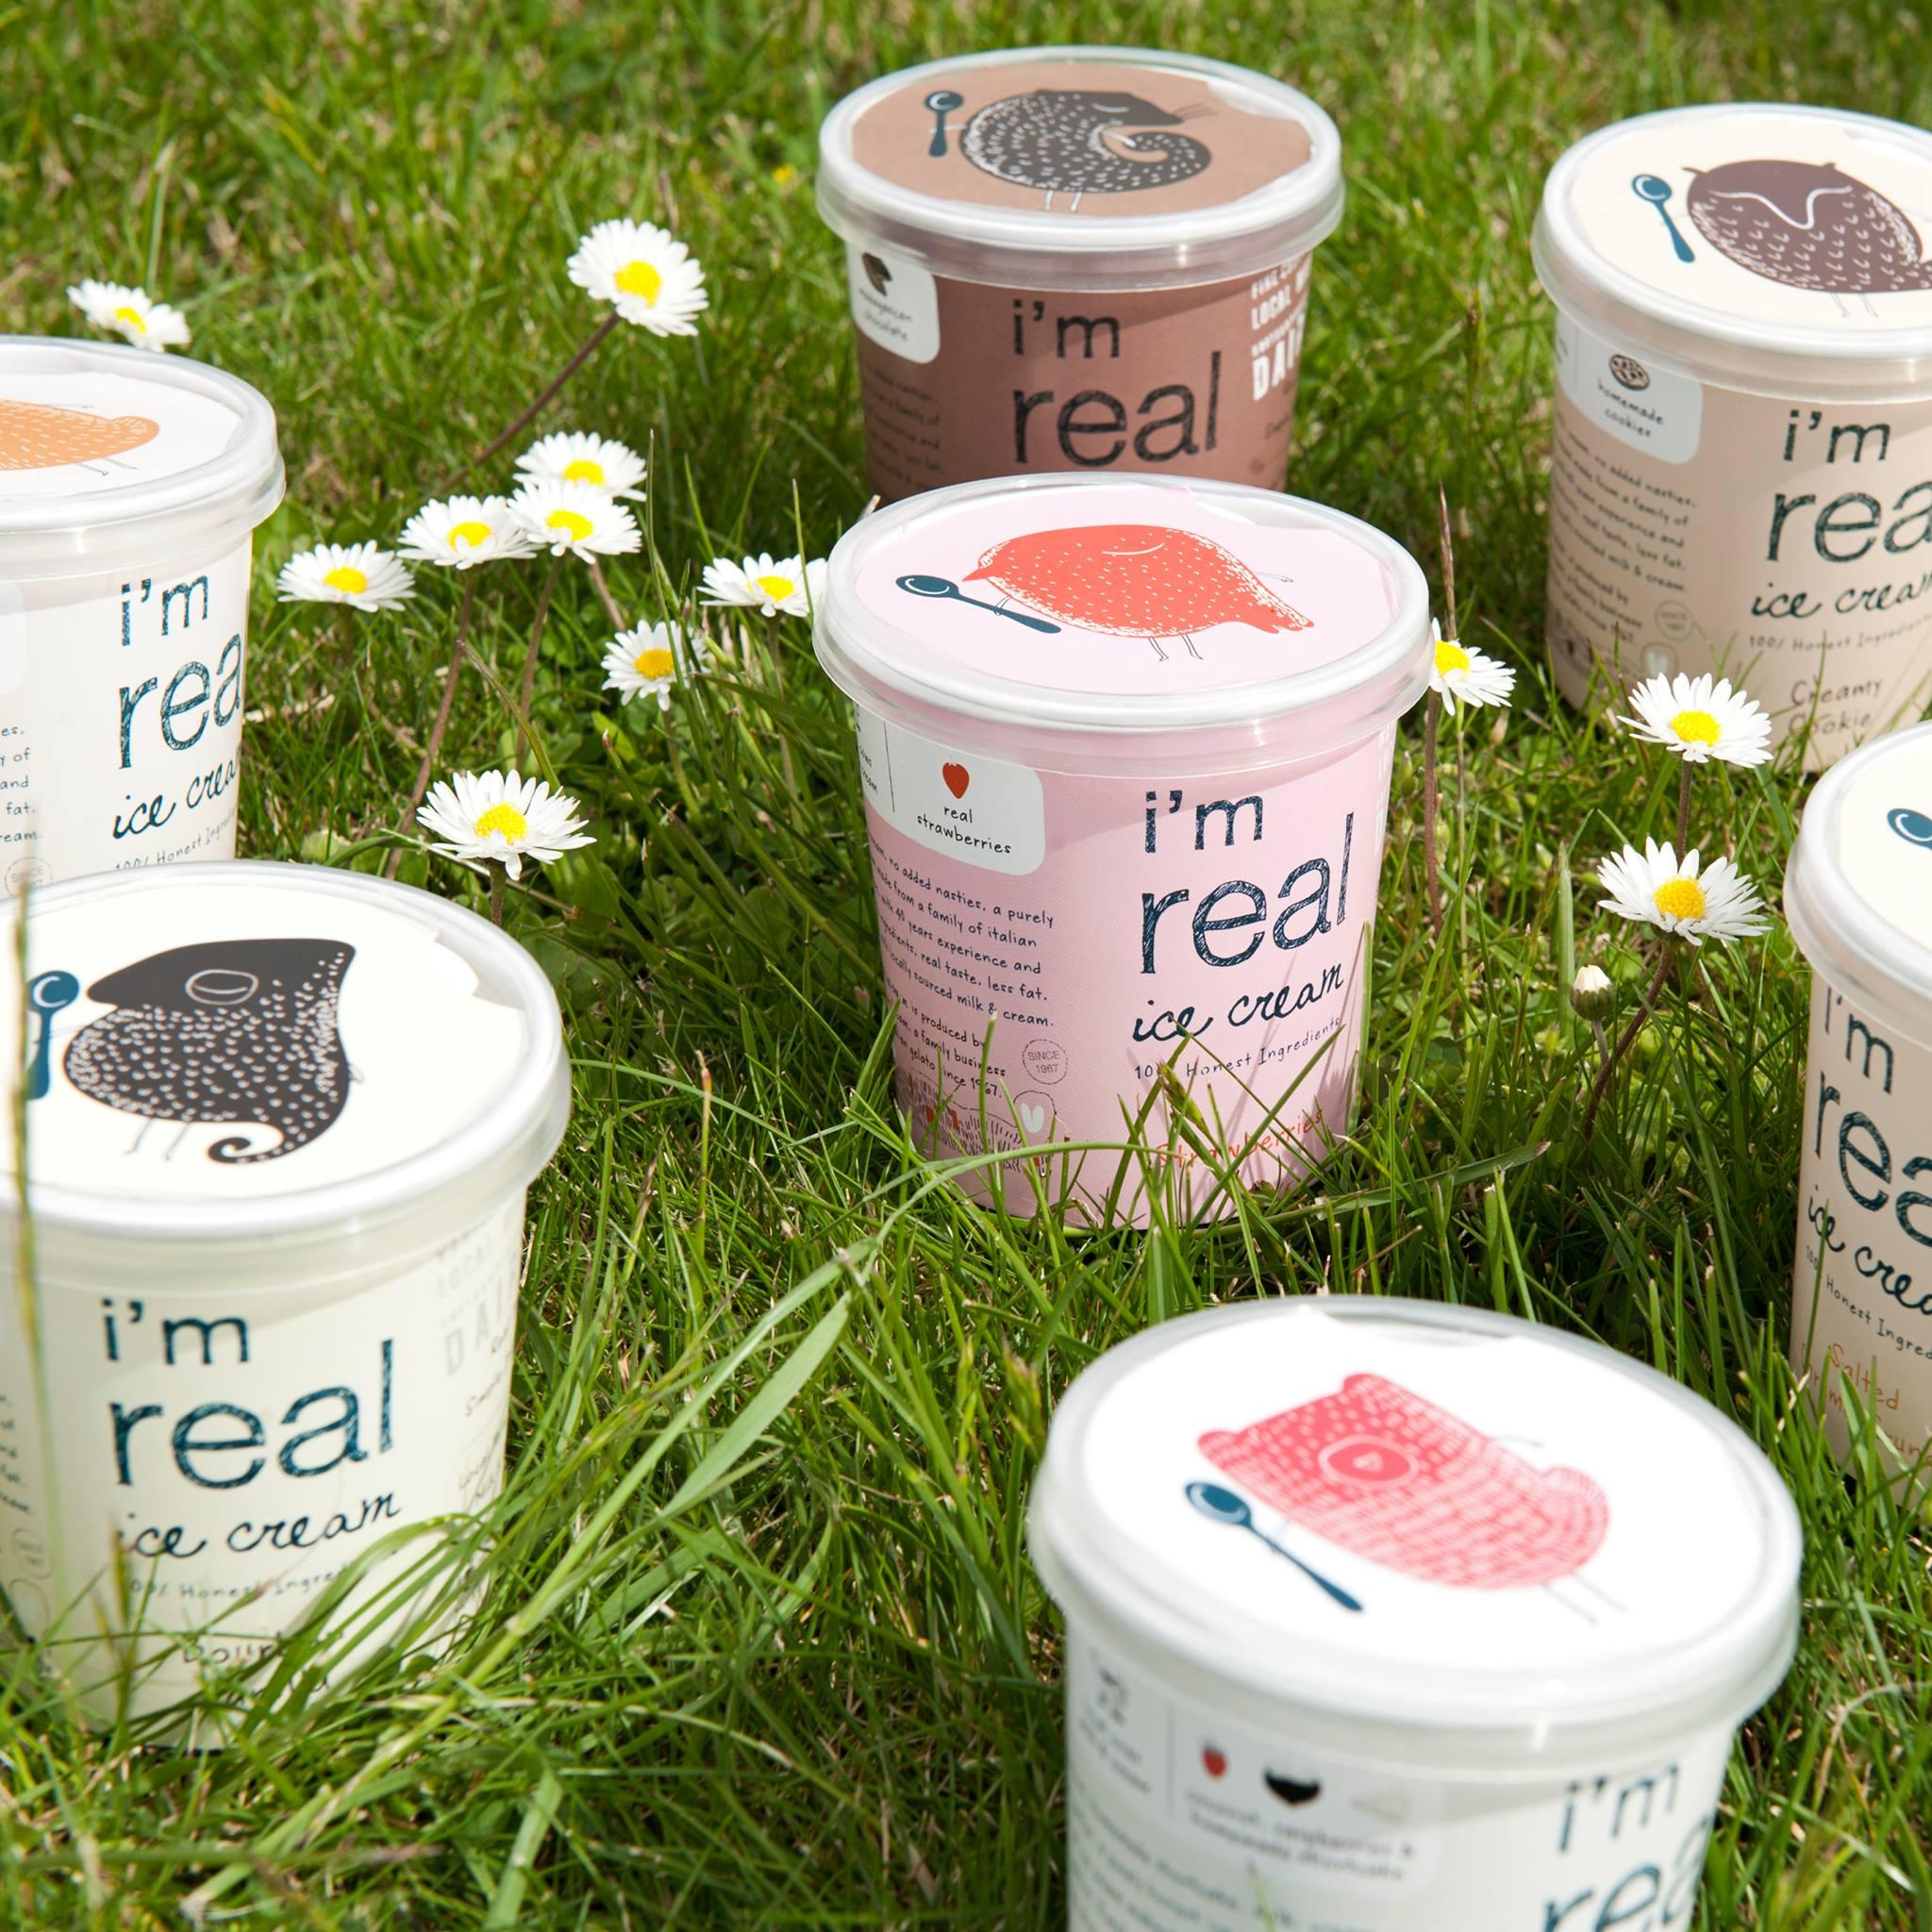 i'm real icecream